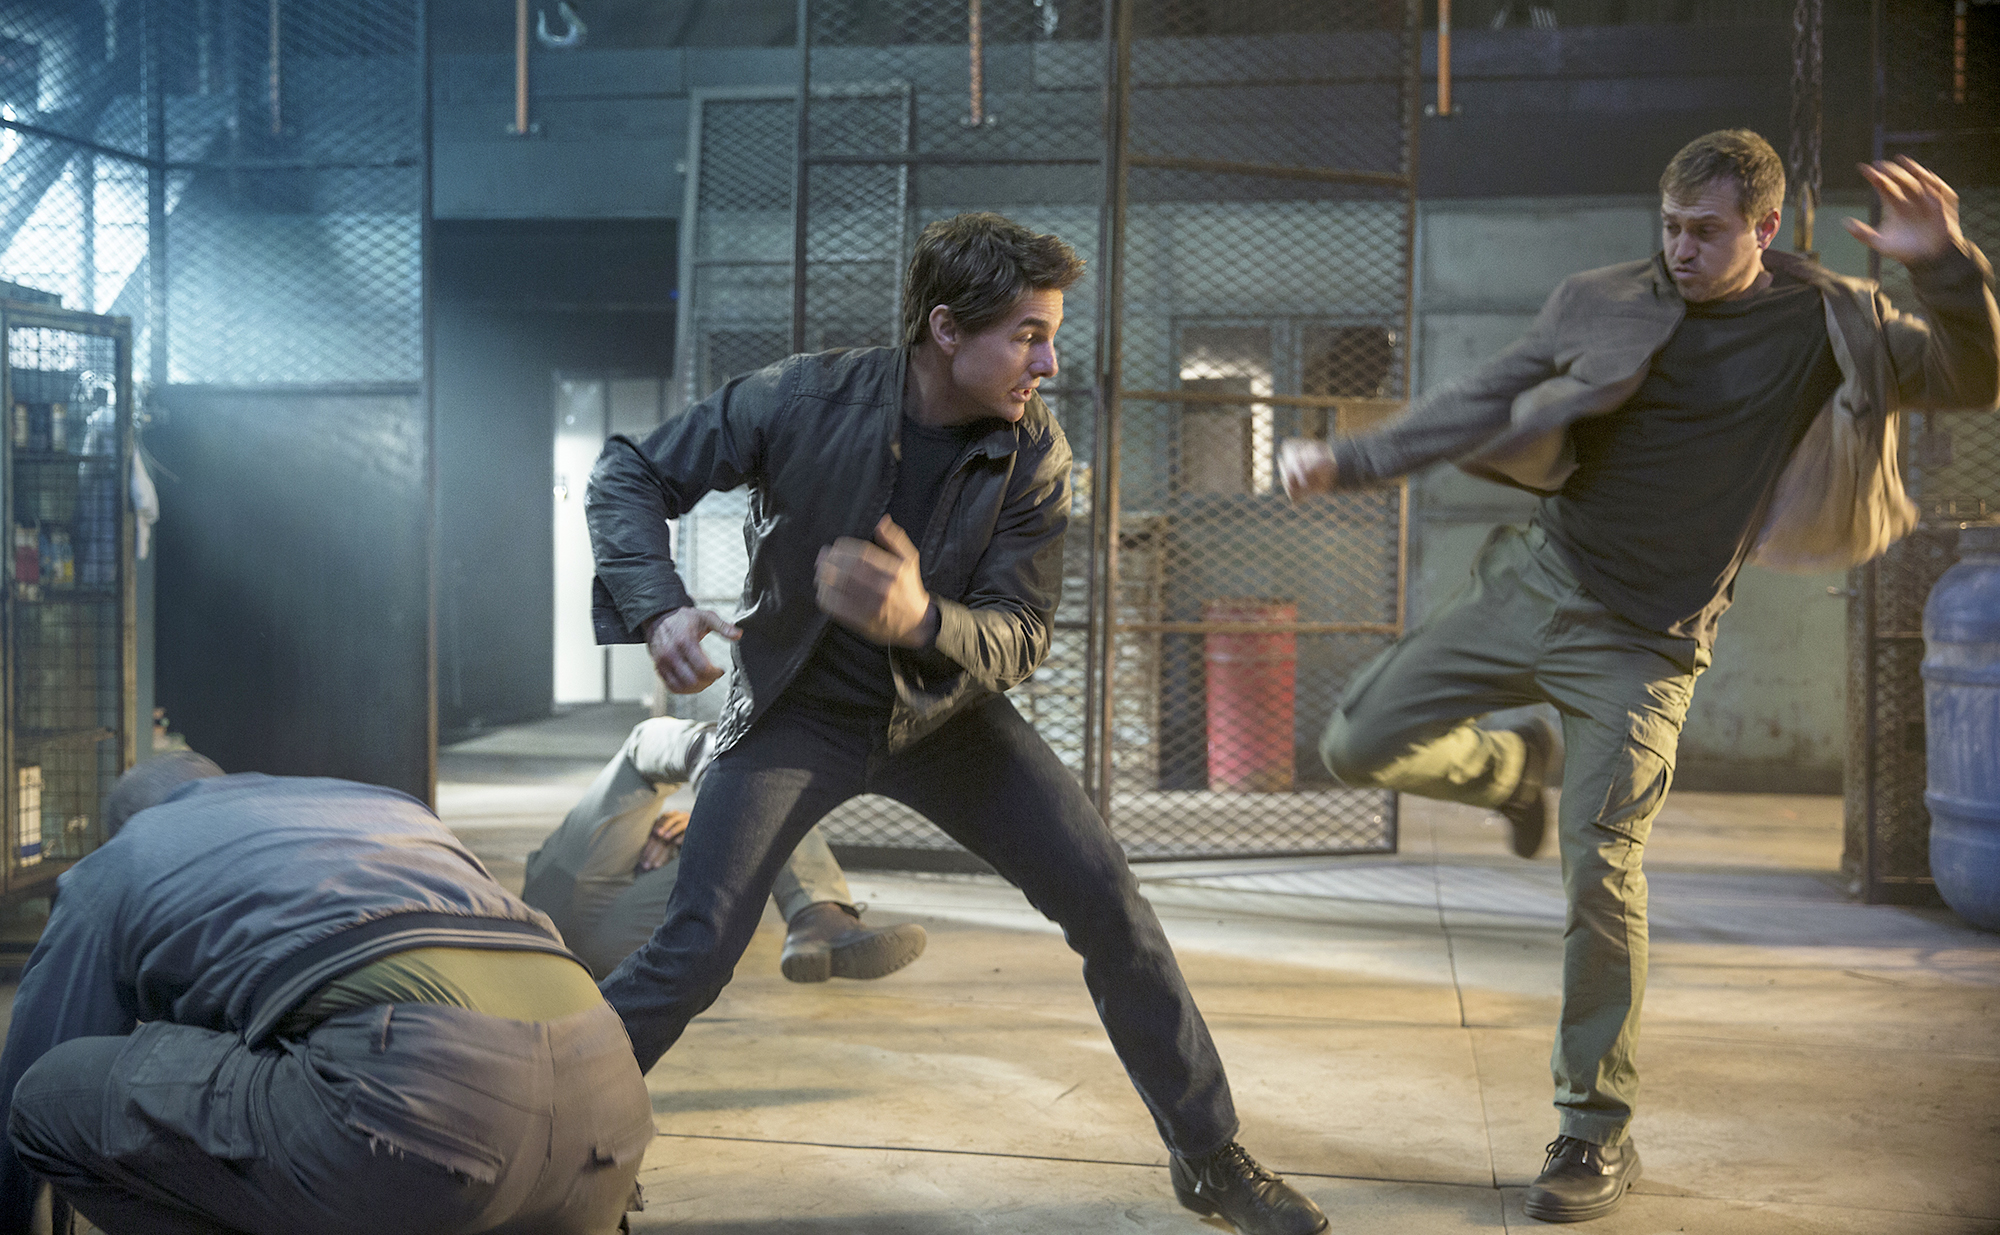 Tom Cruise (as Jack Reacher) and Gordon Alexander in 'Jack Reacher: Never Go Back.'